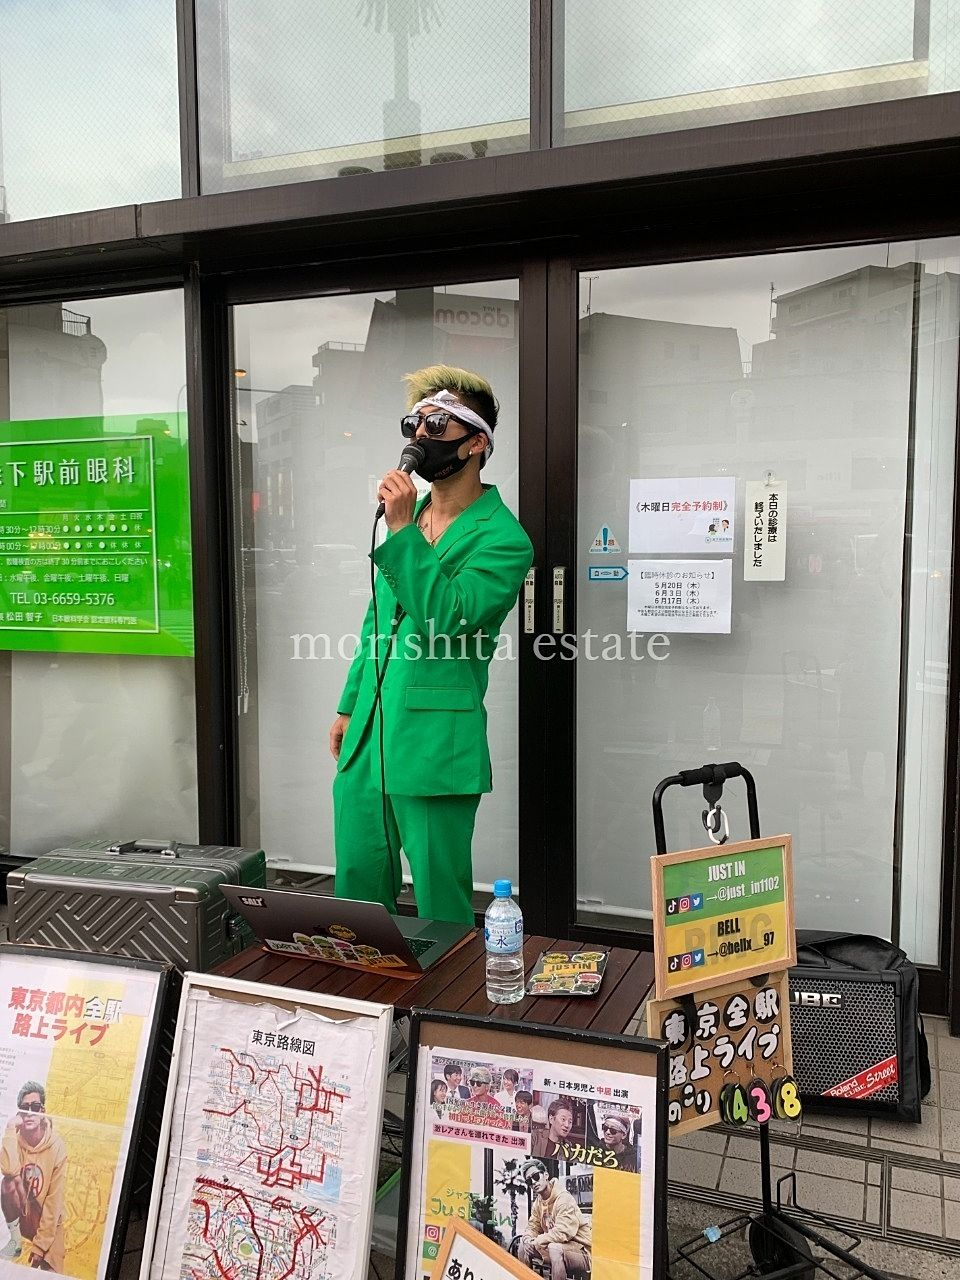 JASTIN ジャスティン 東京全駅 森下駅前 路上ライブ 写真